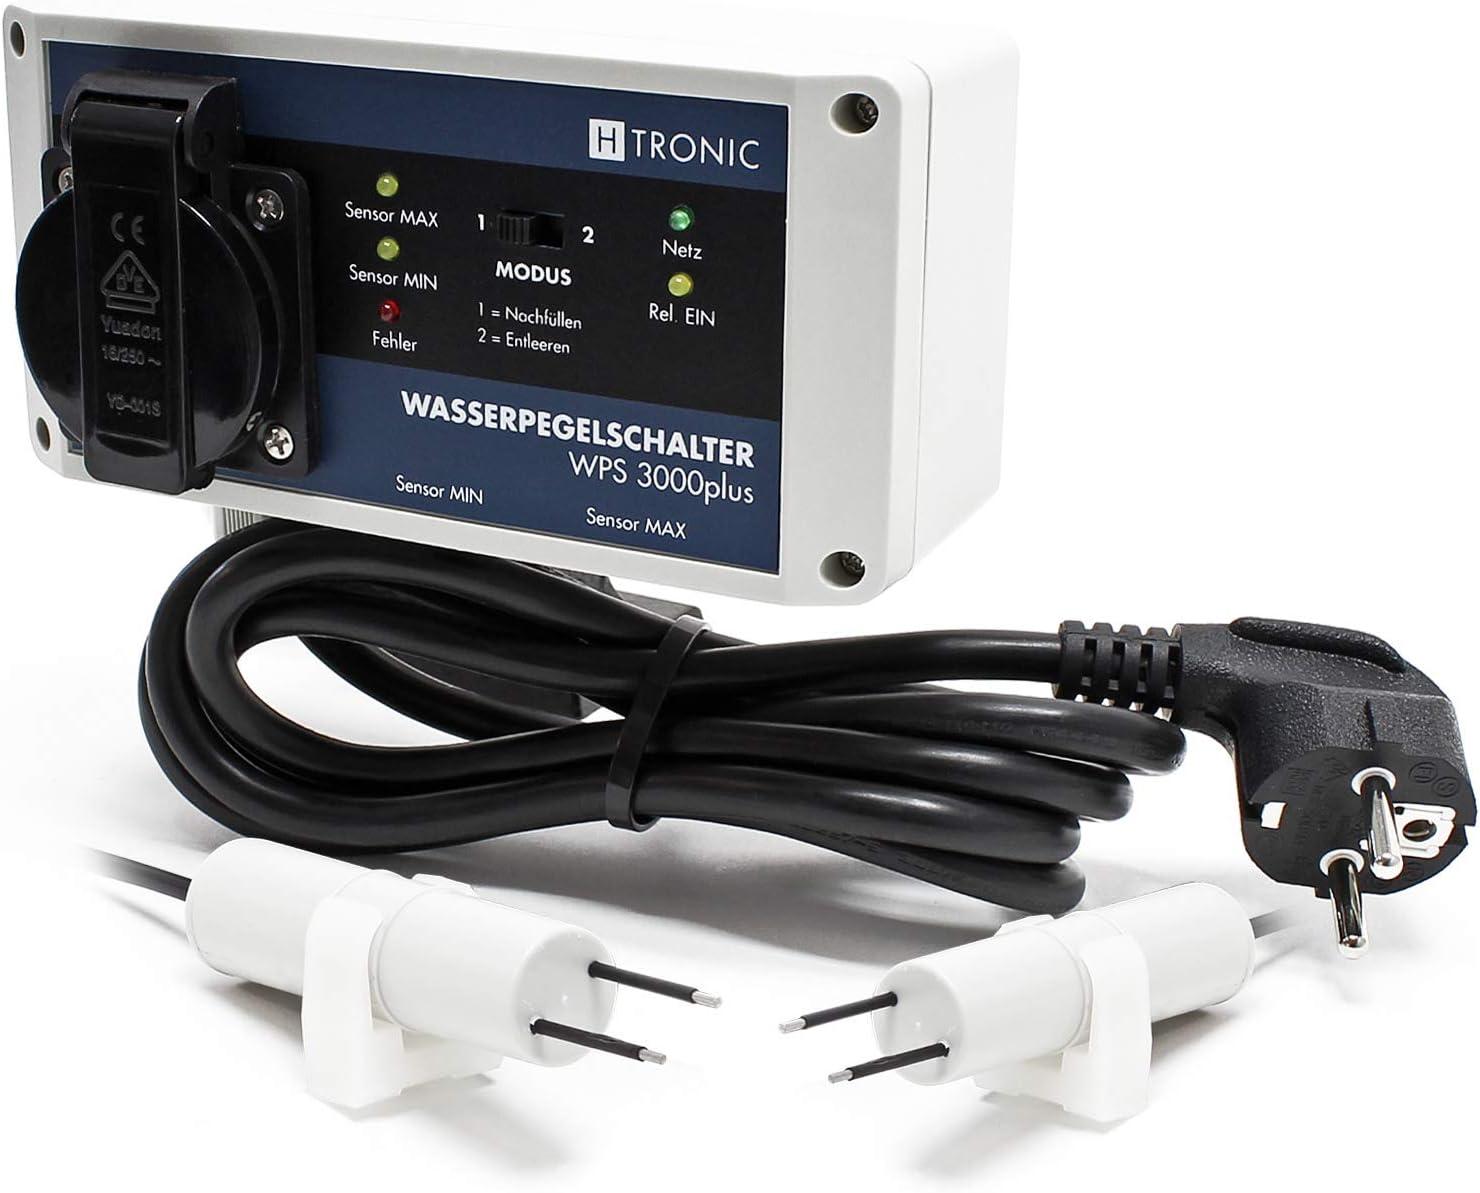 H-Tronic WPS 3000plus elektronischer Füllstands-Differenzschalter mit 2 Sensoren